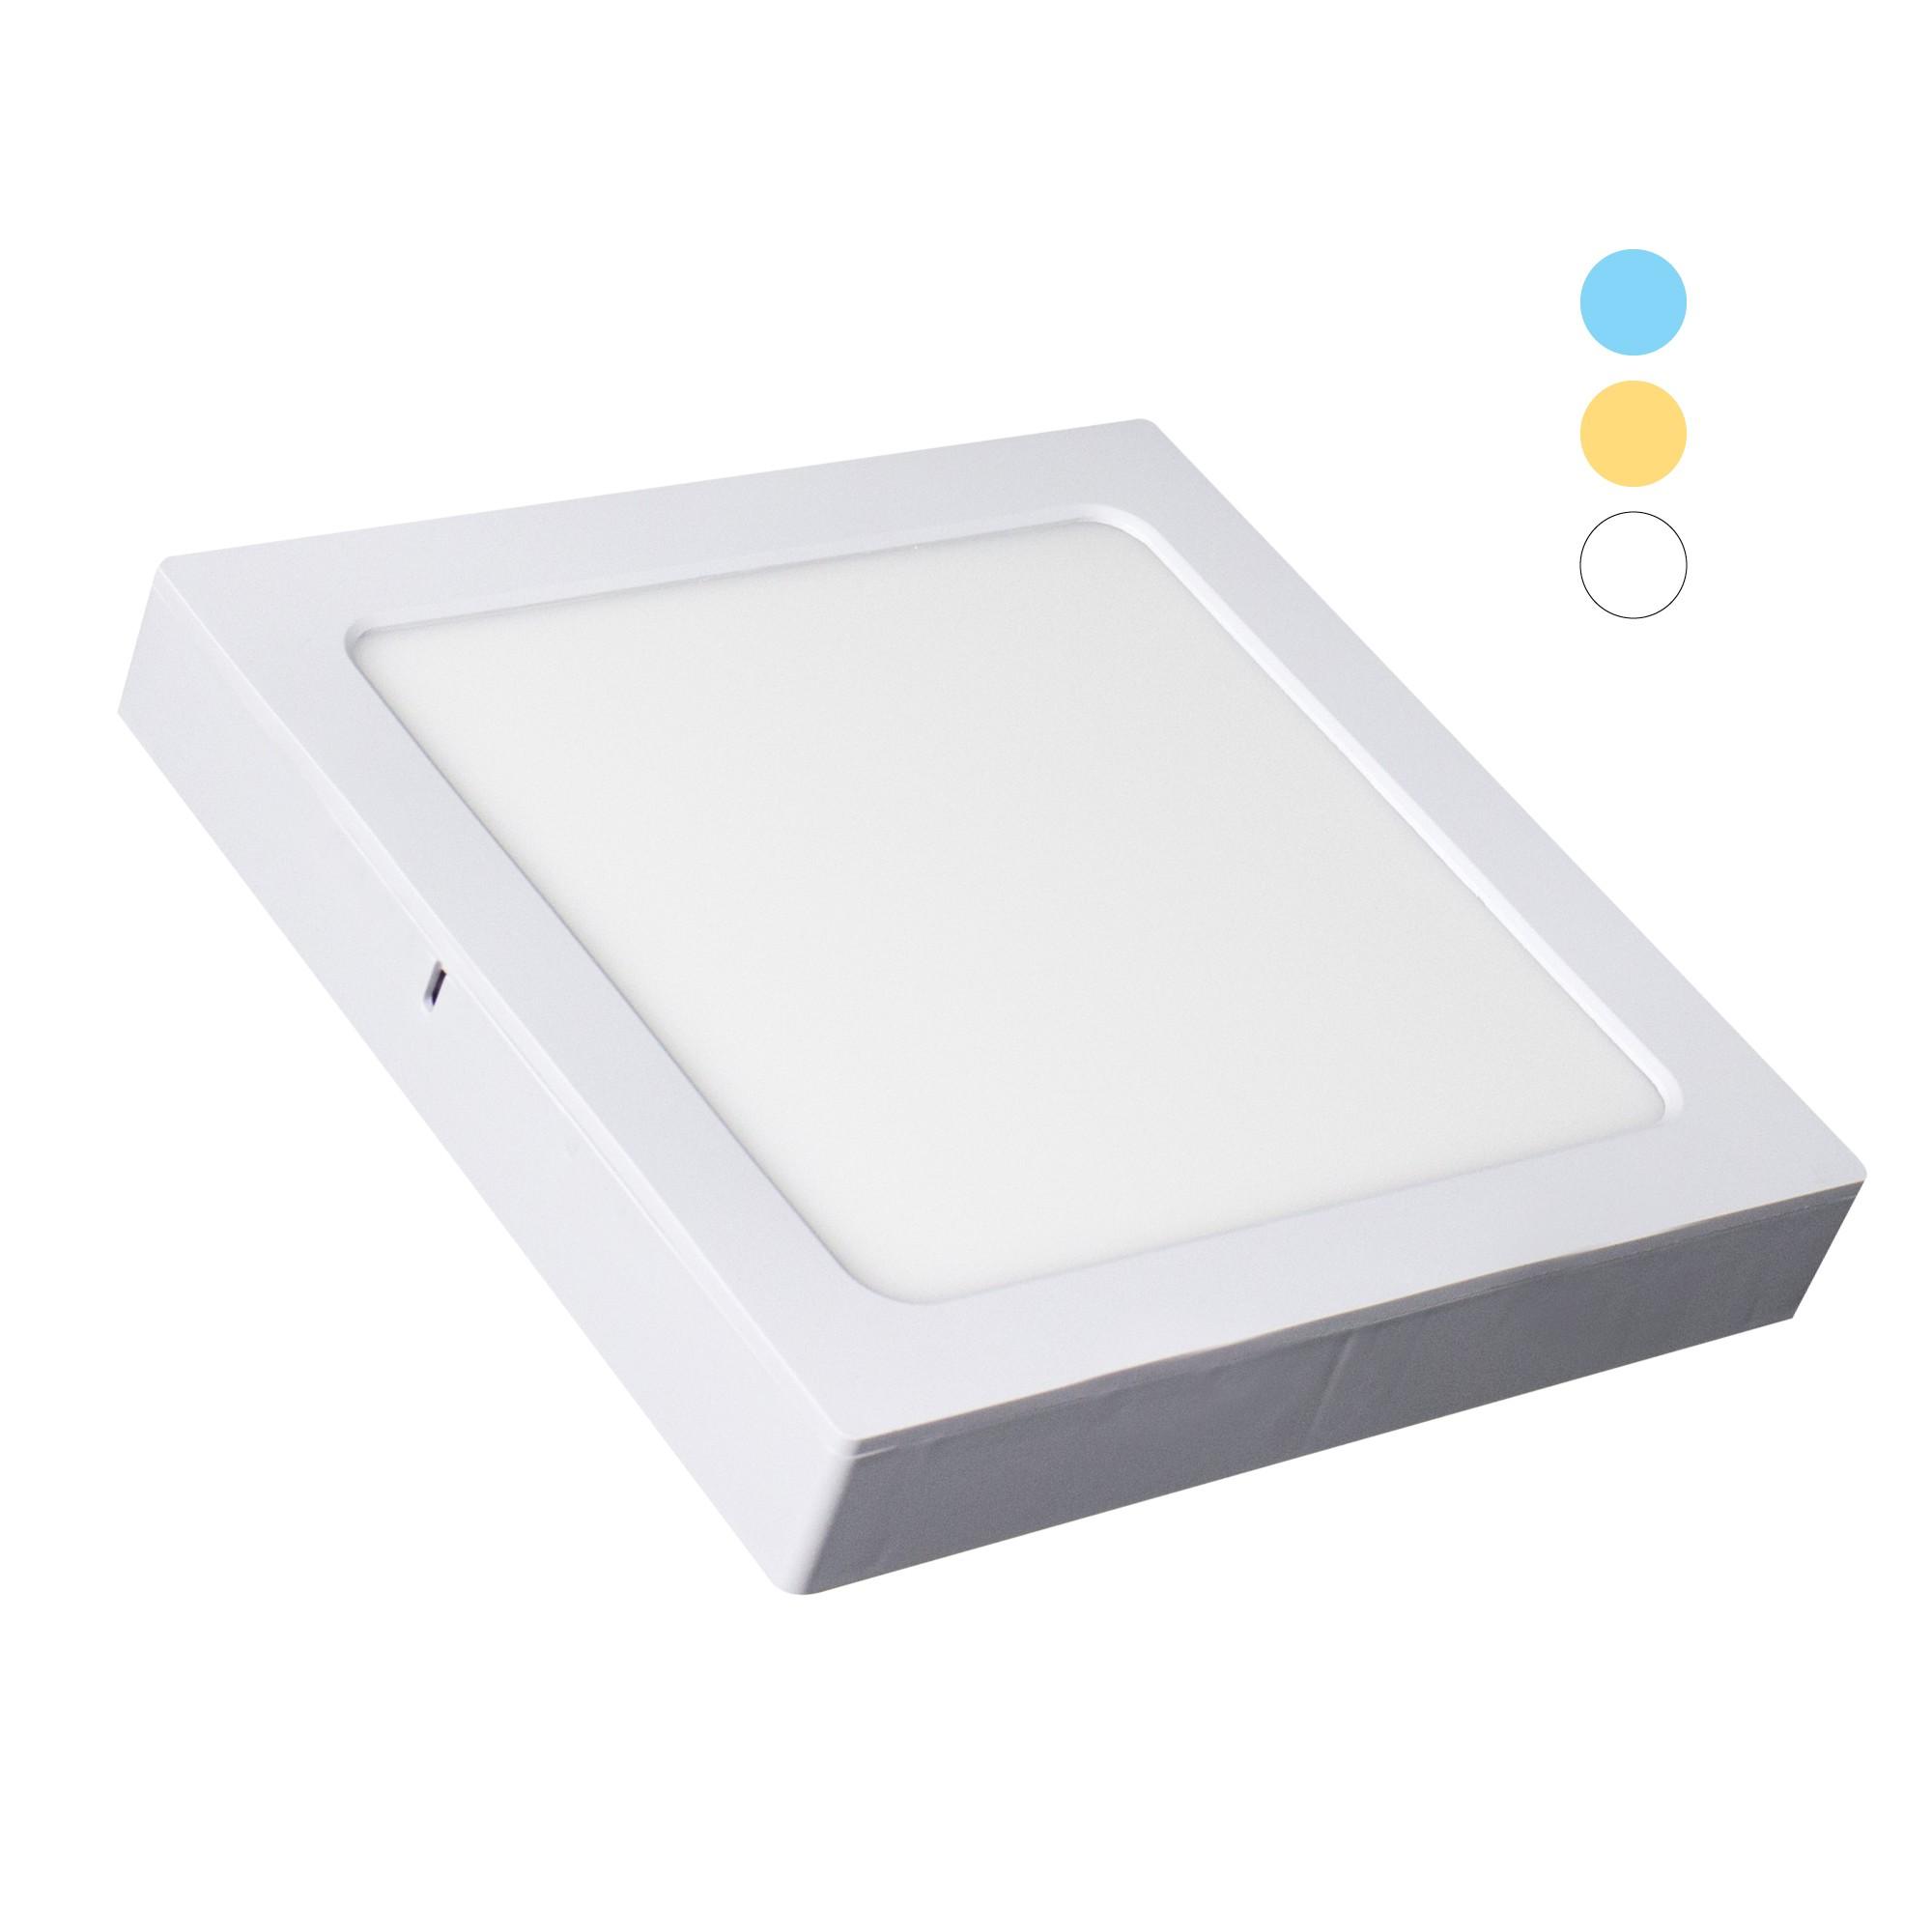 Painel LED Quadrado 16W Tripla Tonalidade 1200lm - Ecoforce